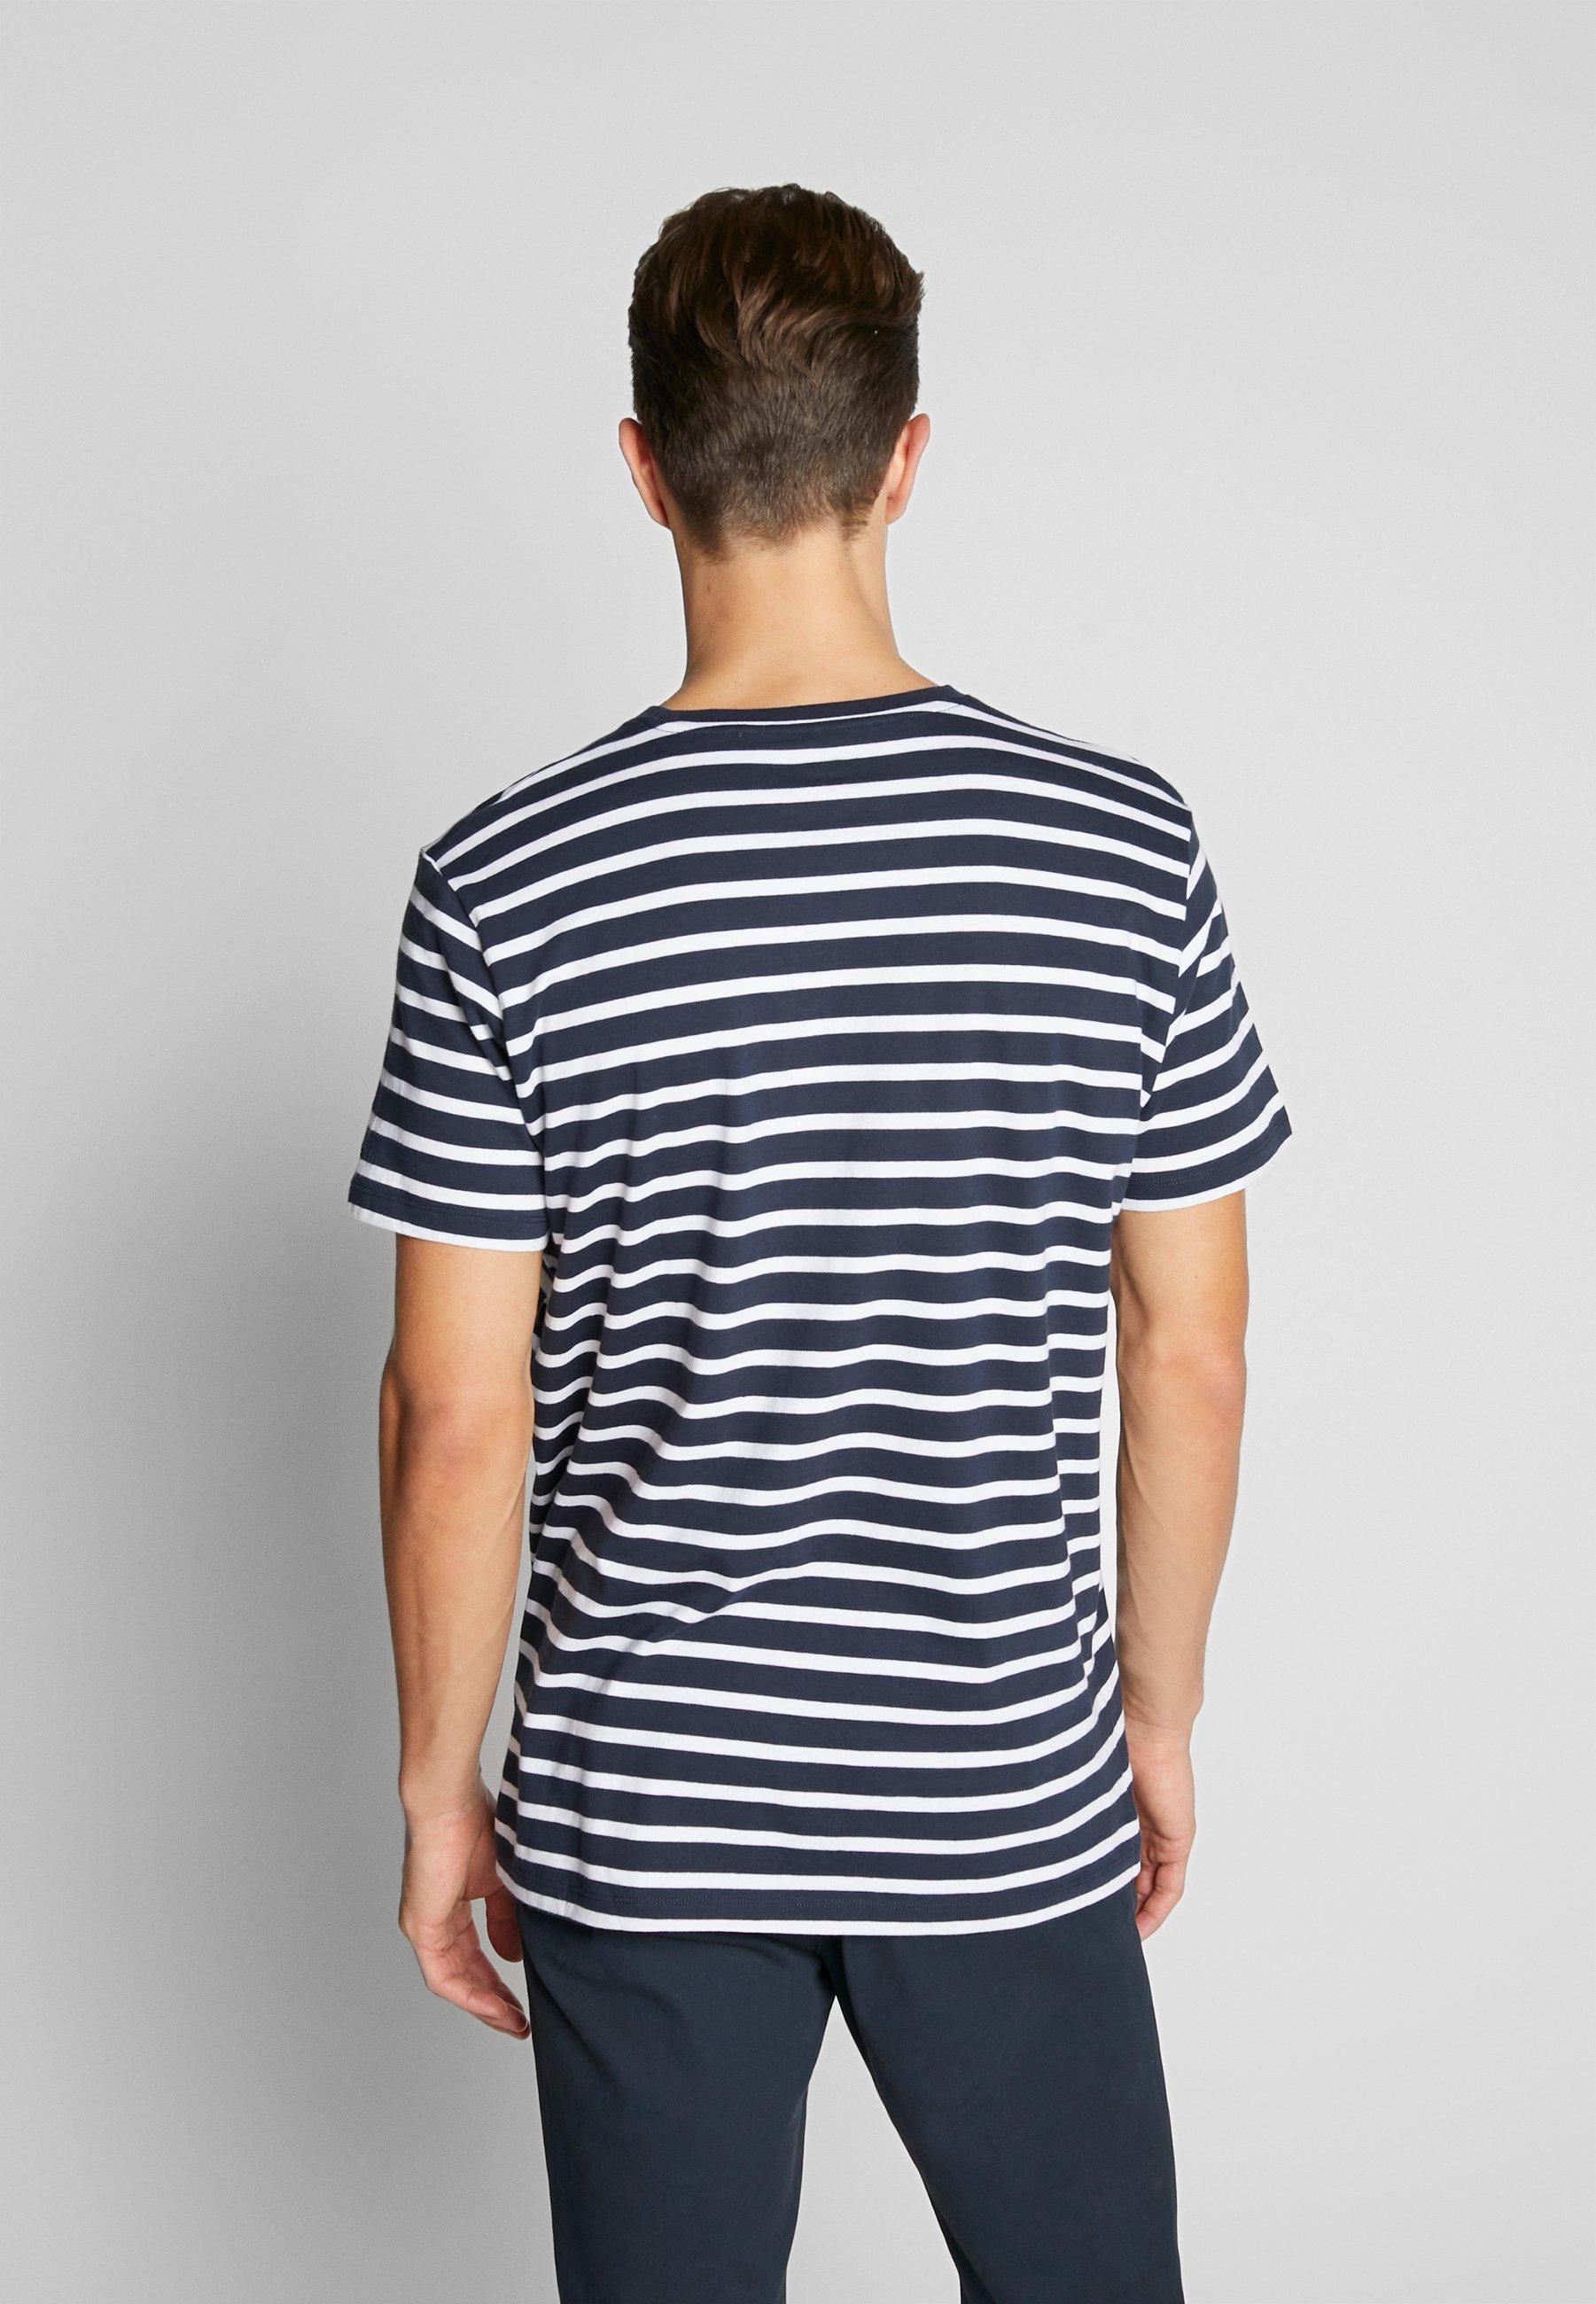 Esprit Print T-shirt - navy e8yLe